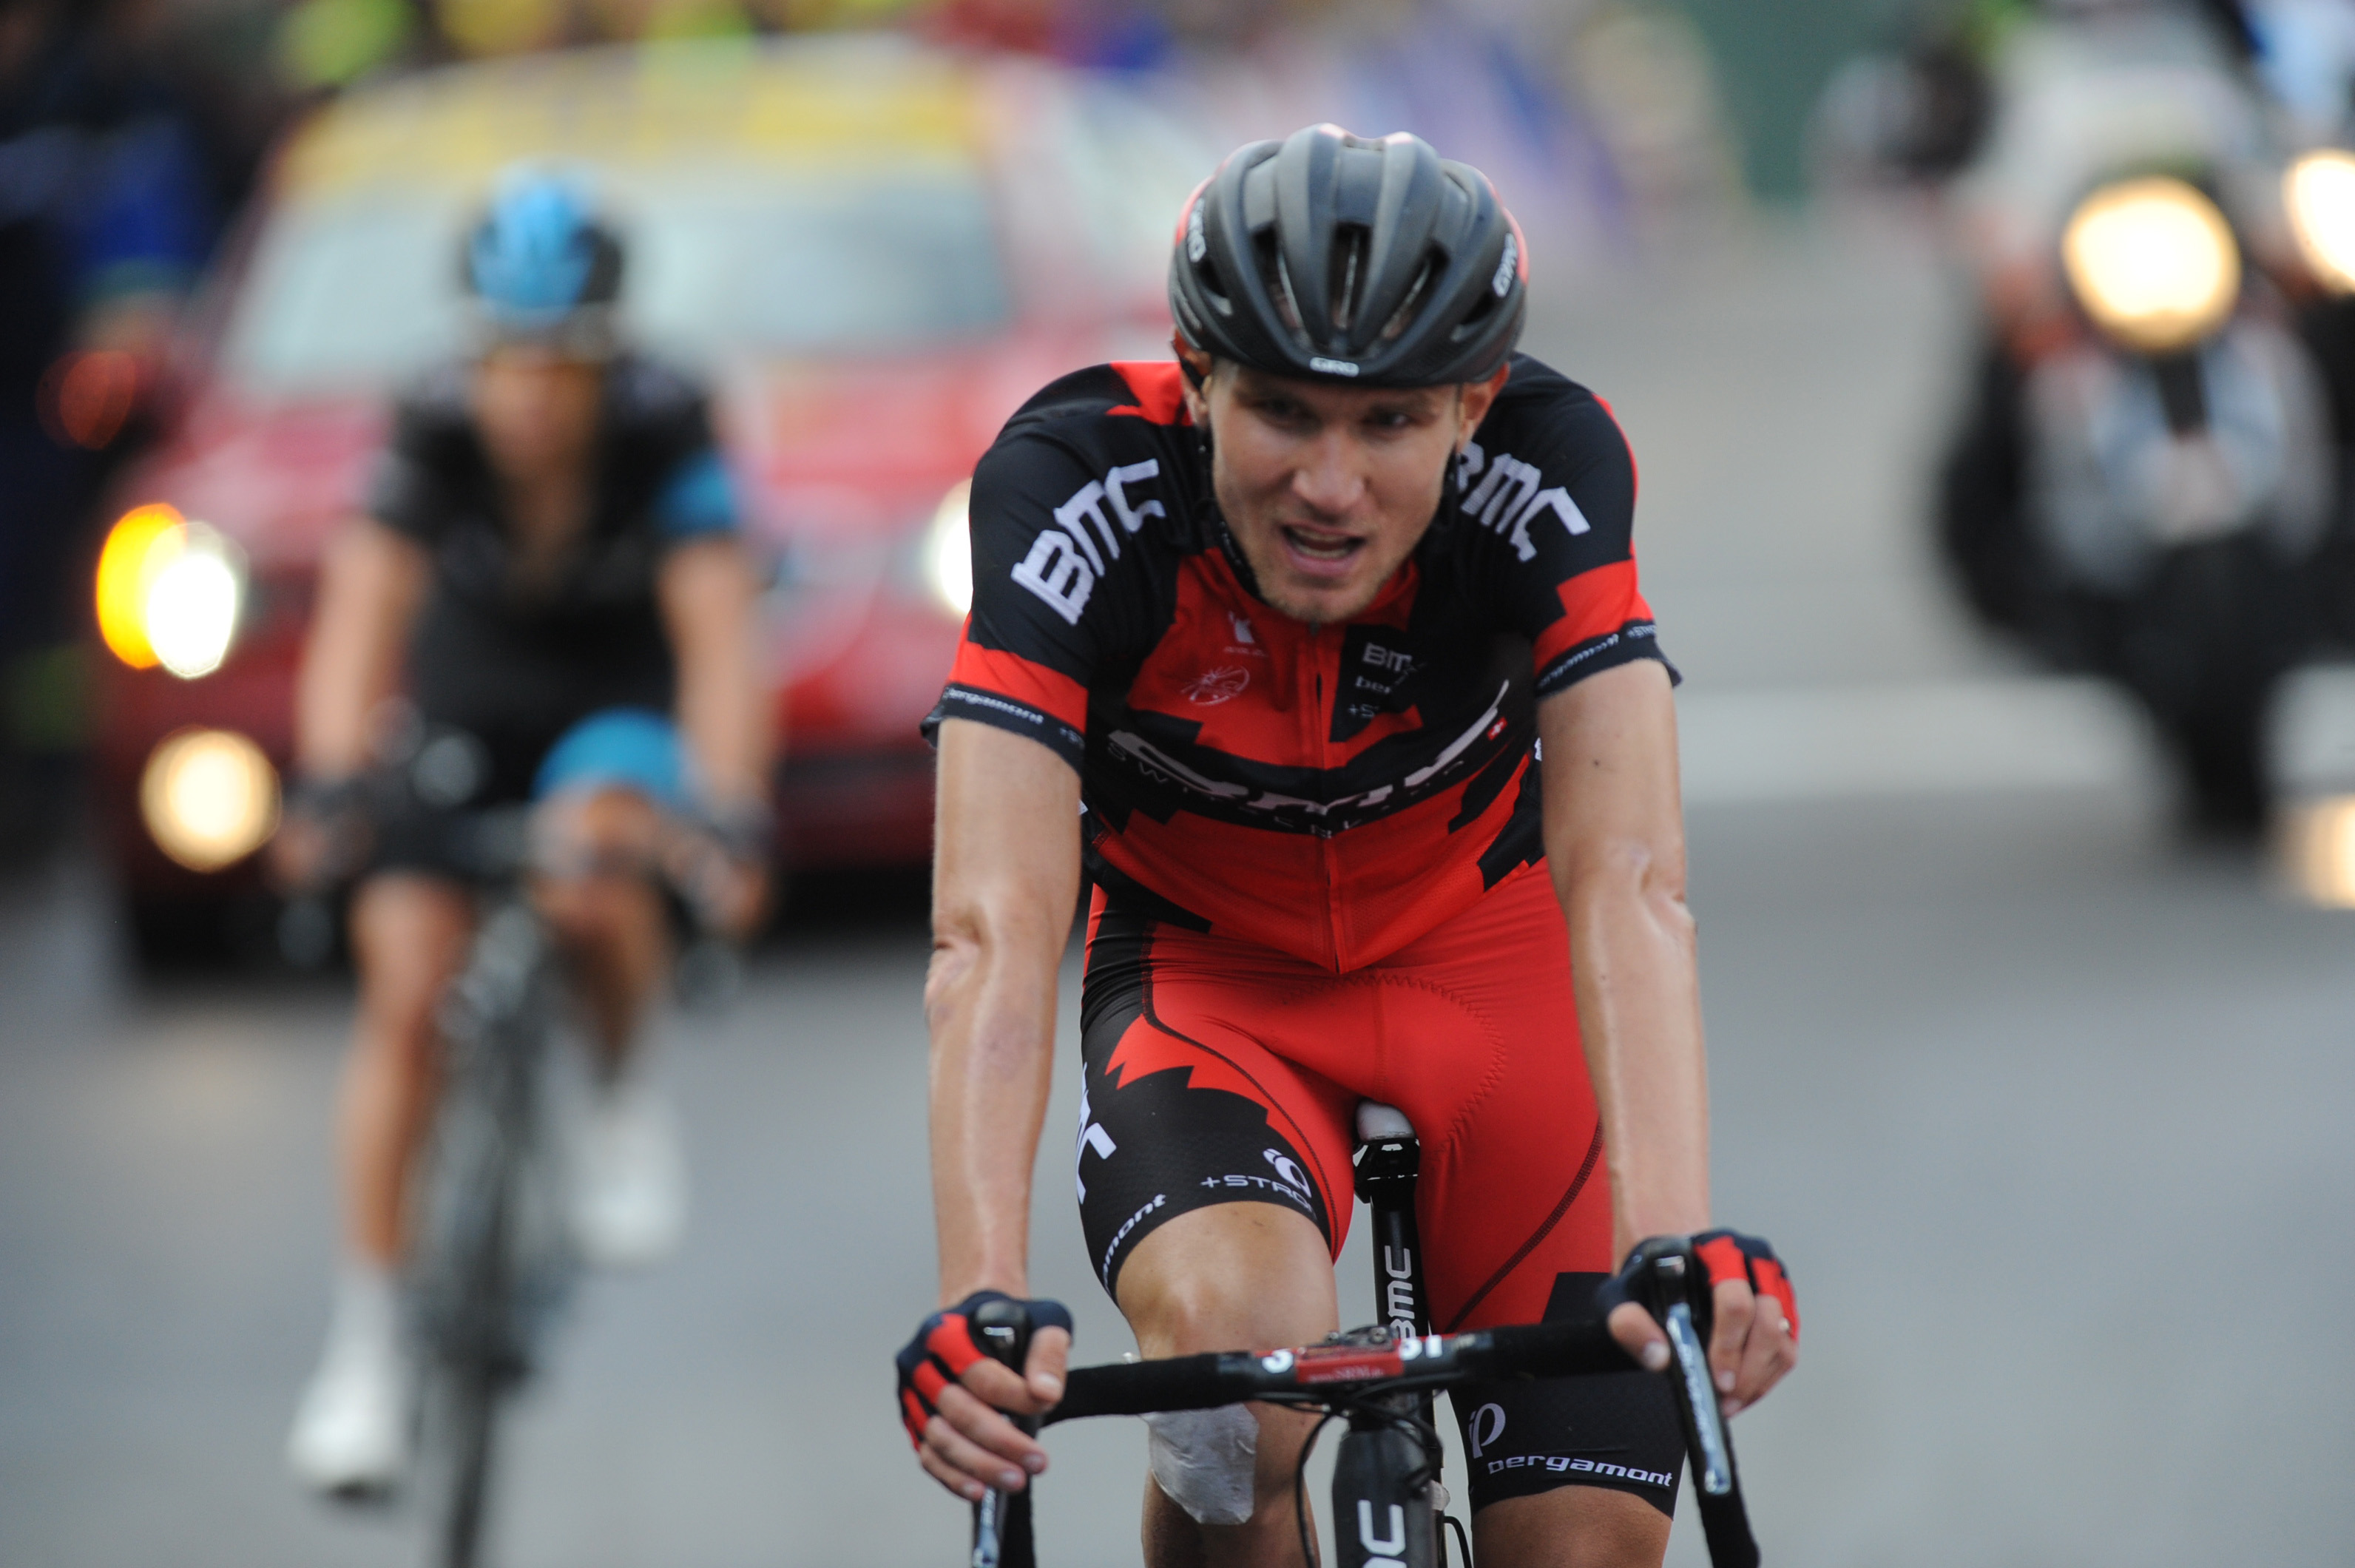 Zielankunft am Ende der 10. Etappe der Tour. (foto: Sirotti)